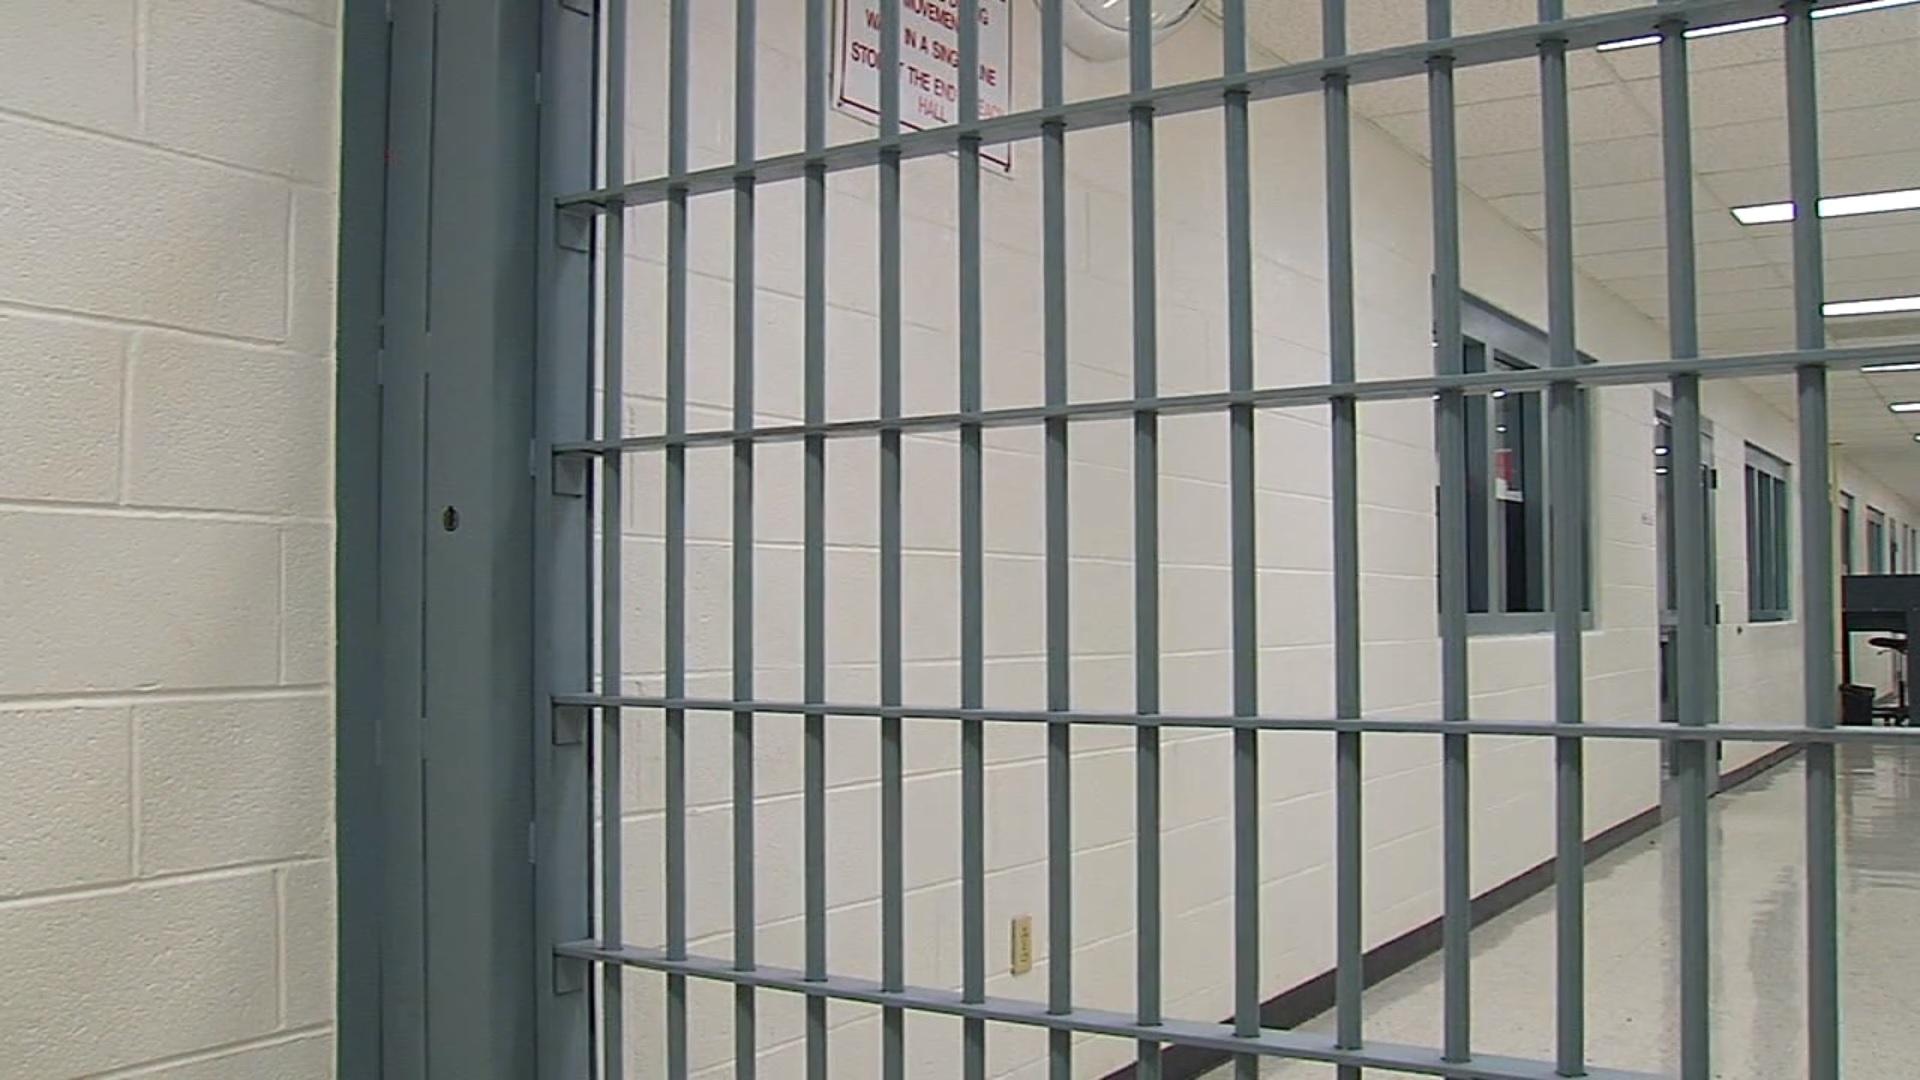 jail generic_543545-873703993